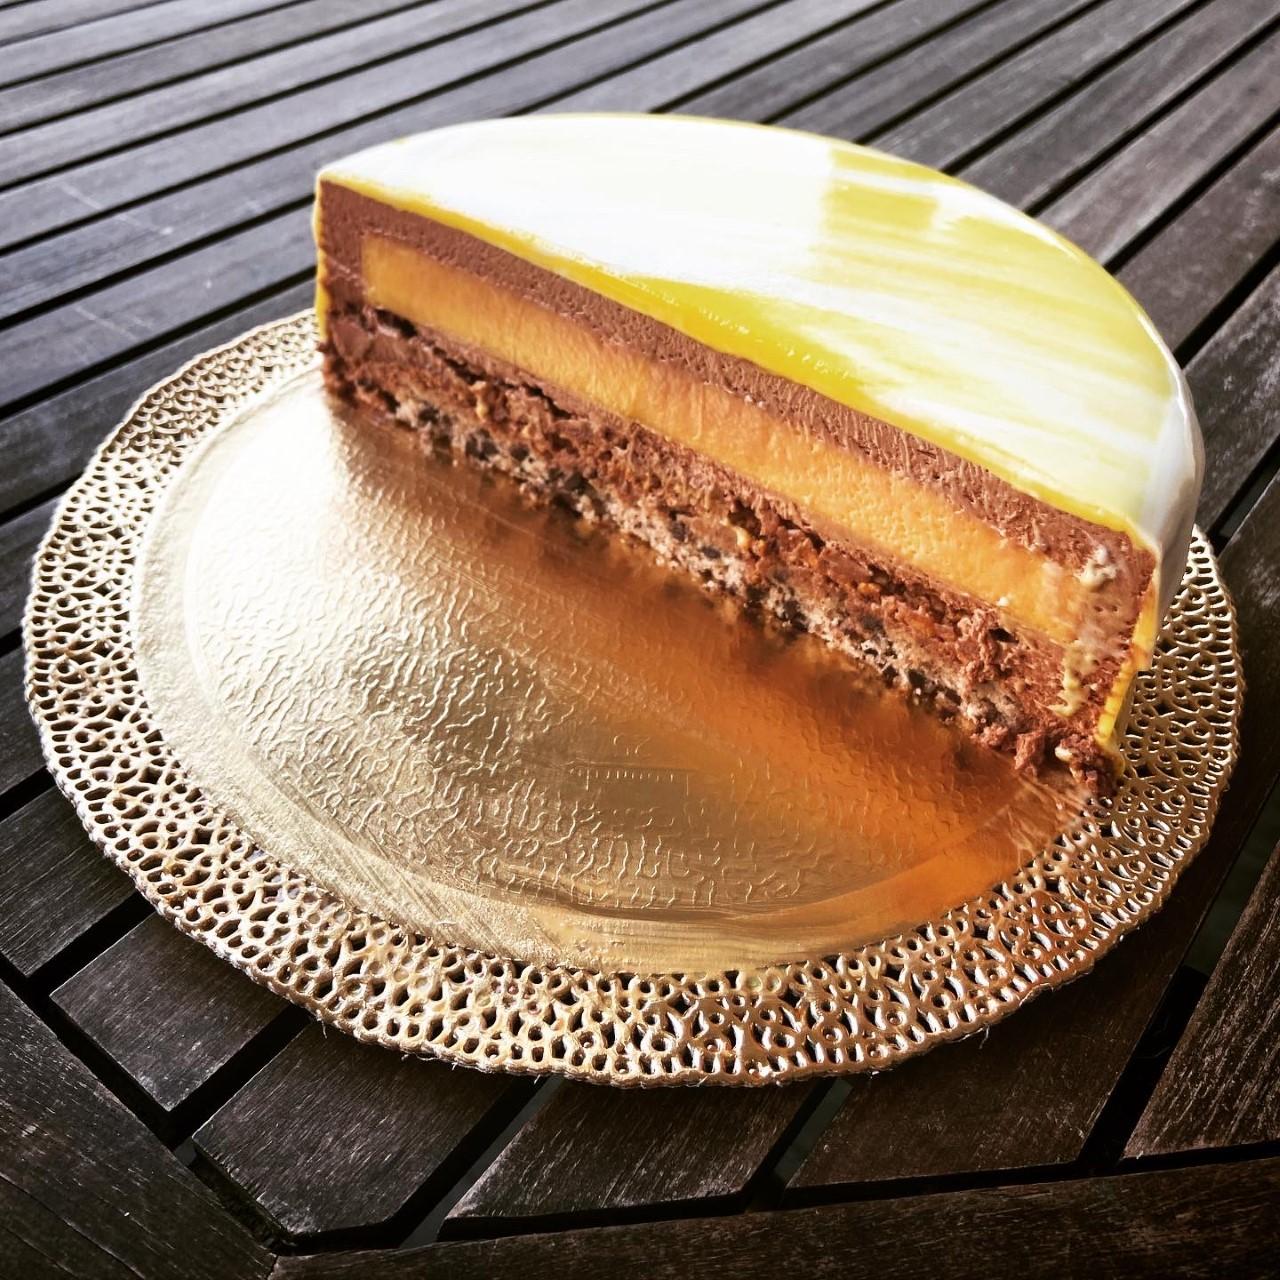 Torte moderne - passion fruit gianduia e pralinato